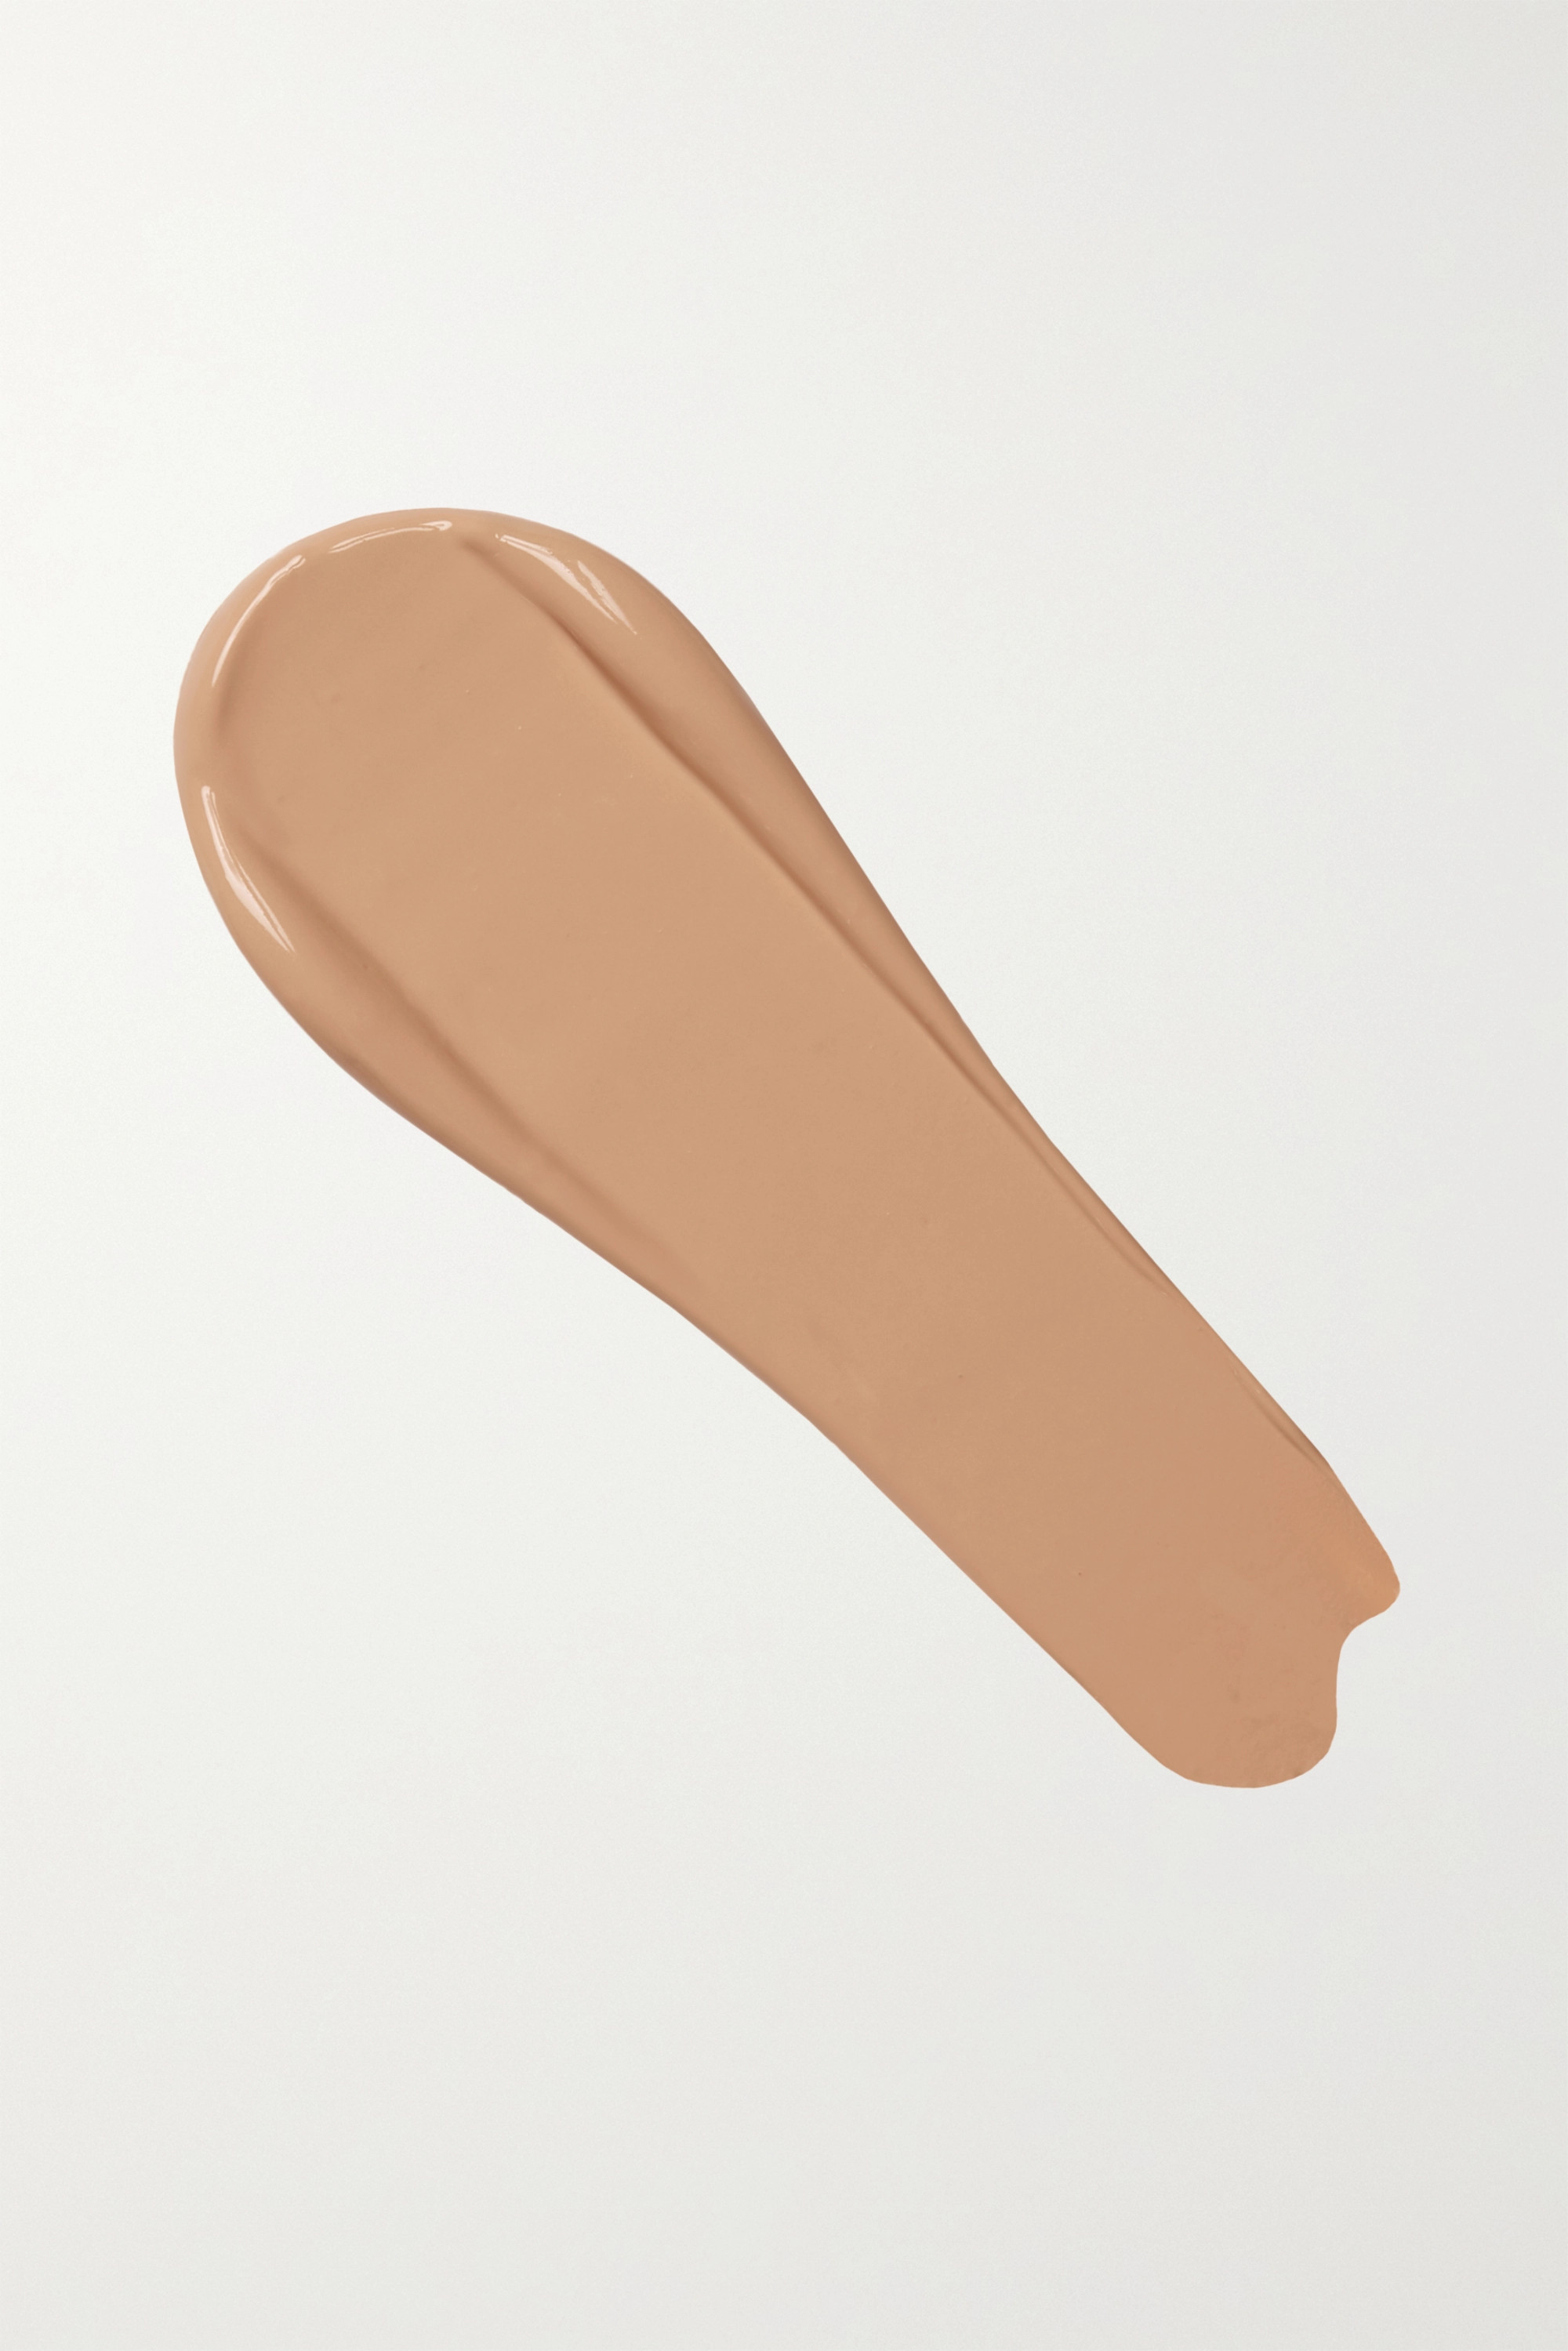 Pat McGrath Labs Skin Fetish: Sublime Perfection Concealer - LM9, 5ml